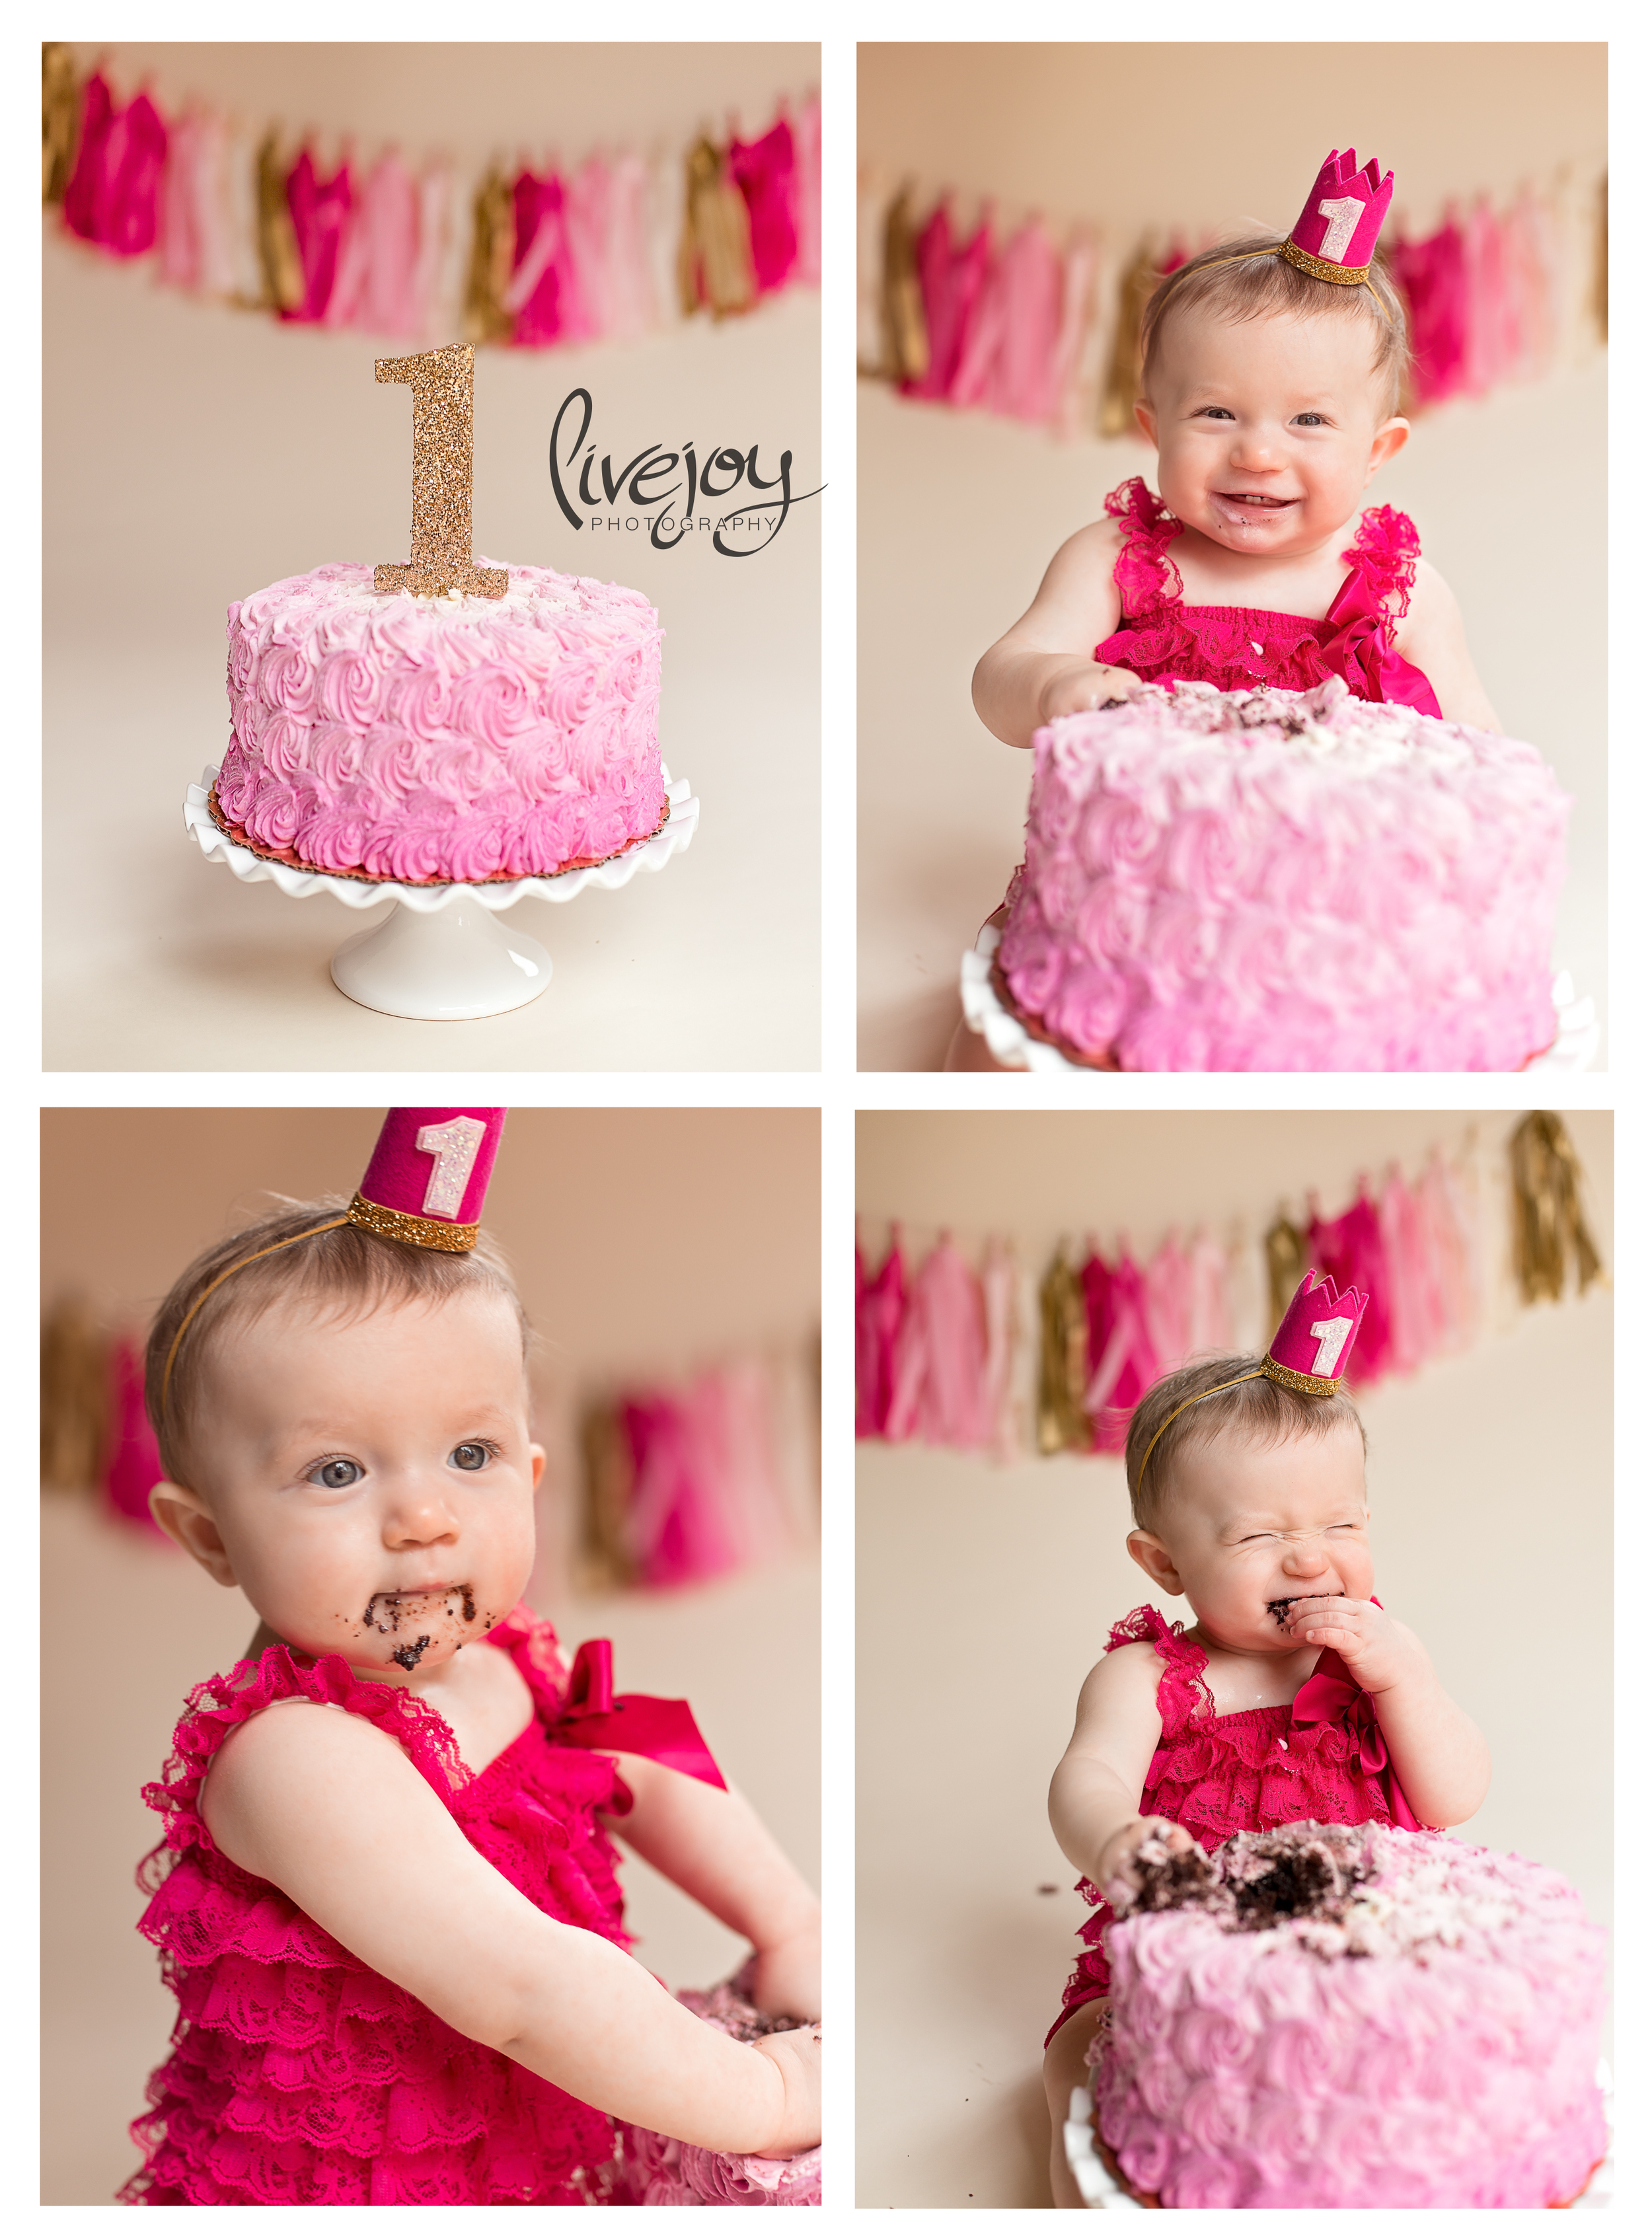 1 Year and Cake Smash Baby Photography | Oregon | LiveJoy Photography